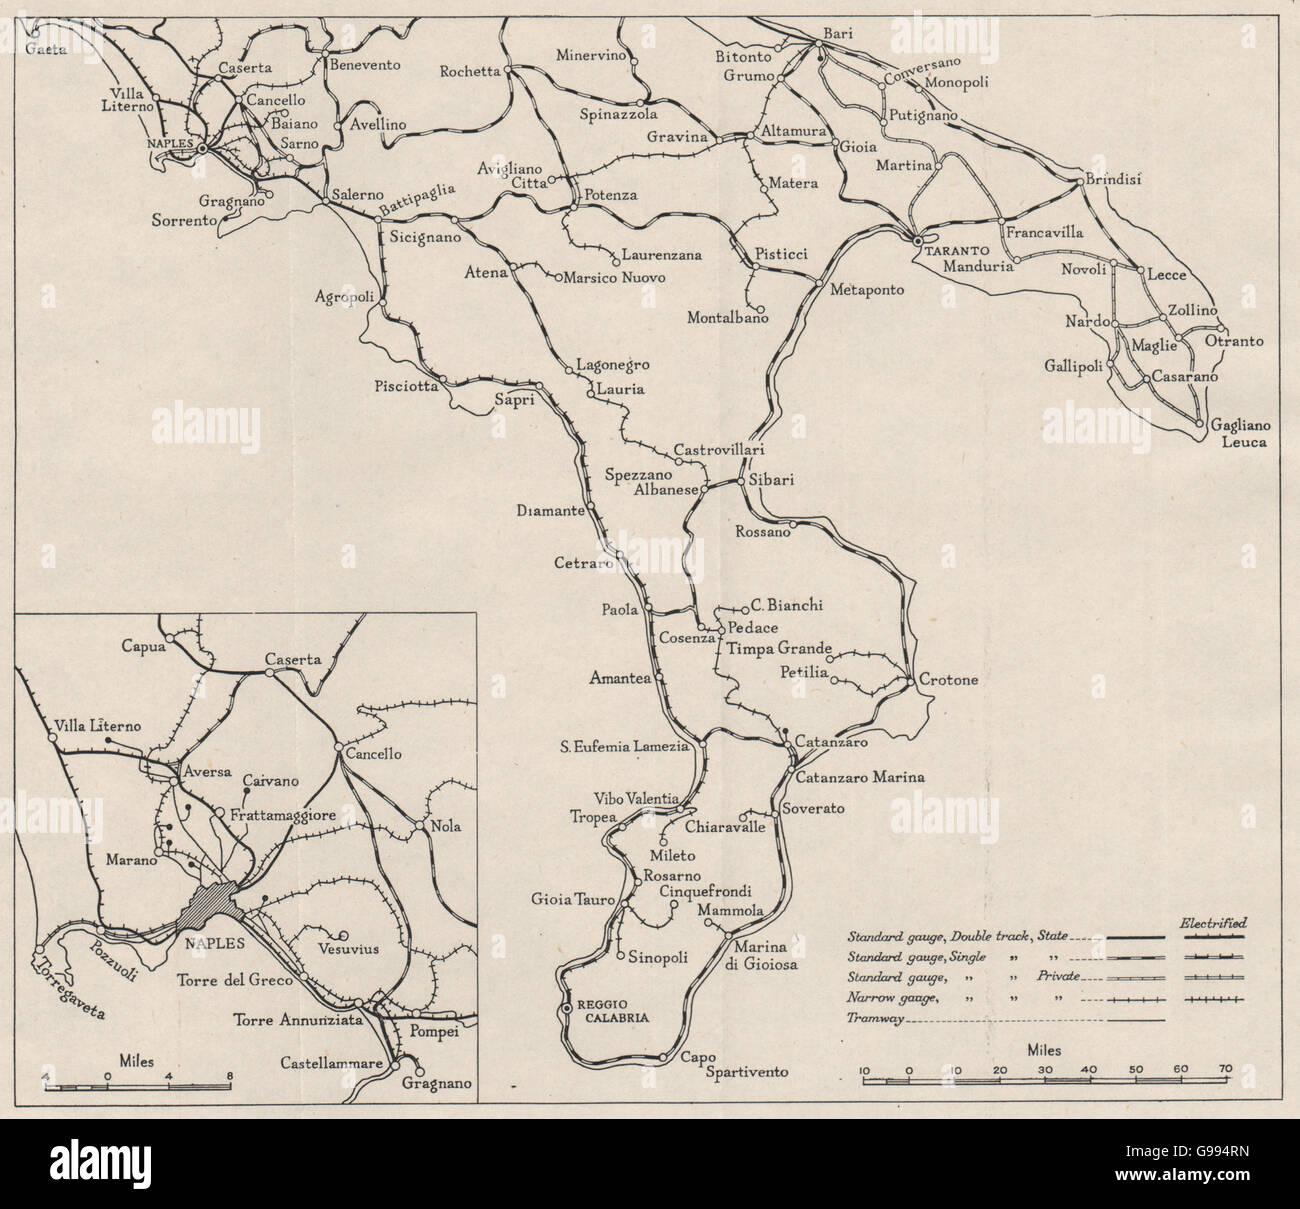 British Map Ww2 Stock Photos & British Map Ww2 Stock